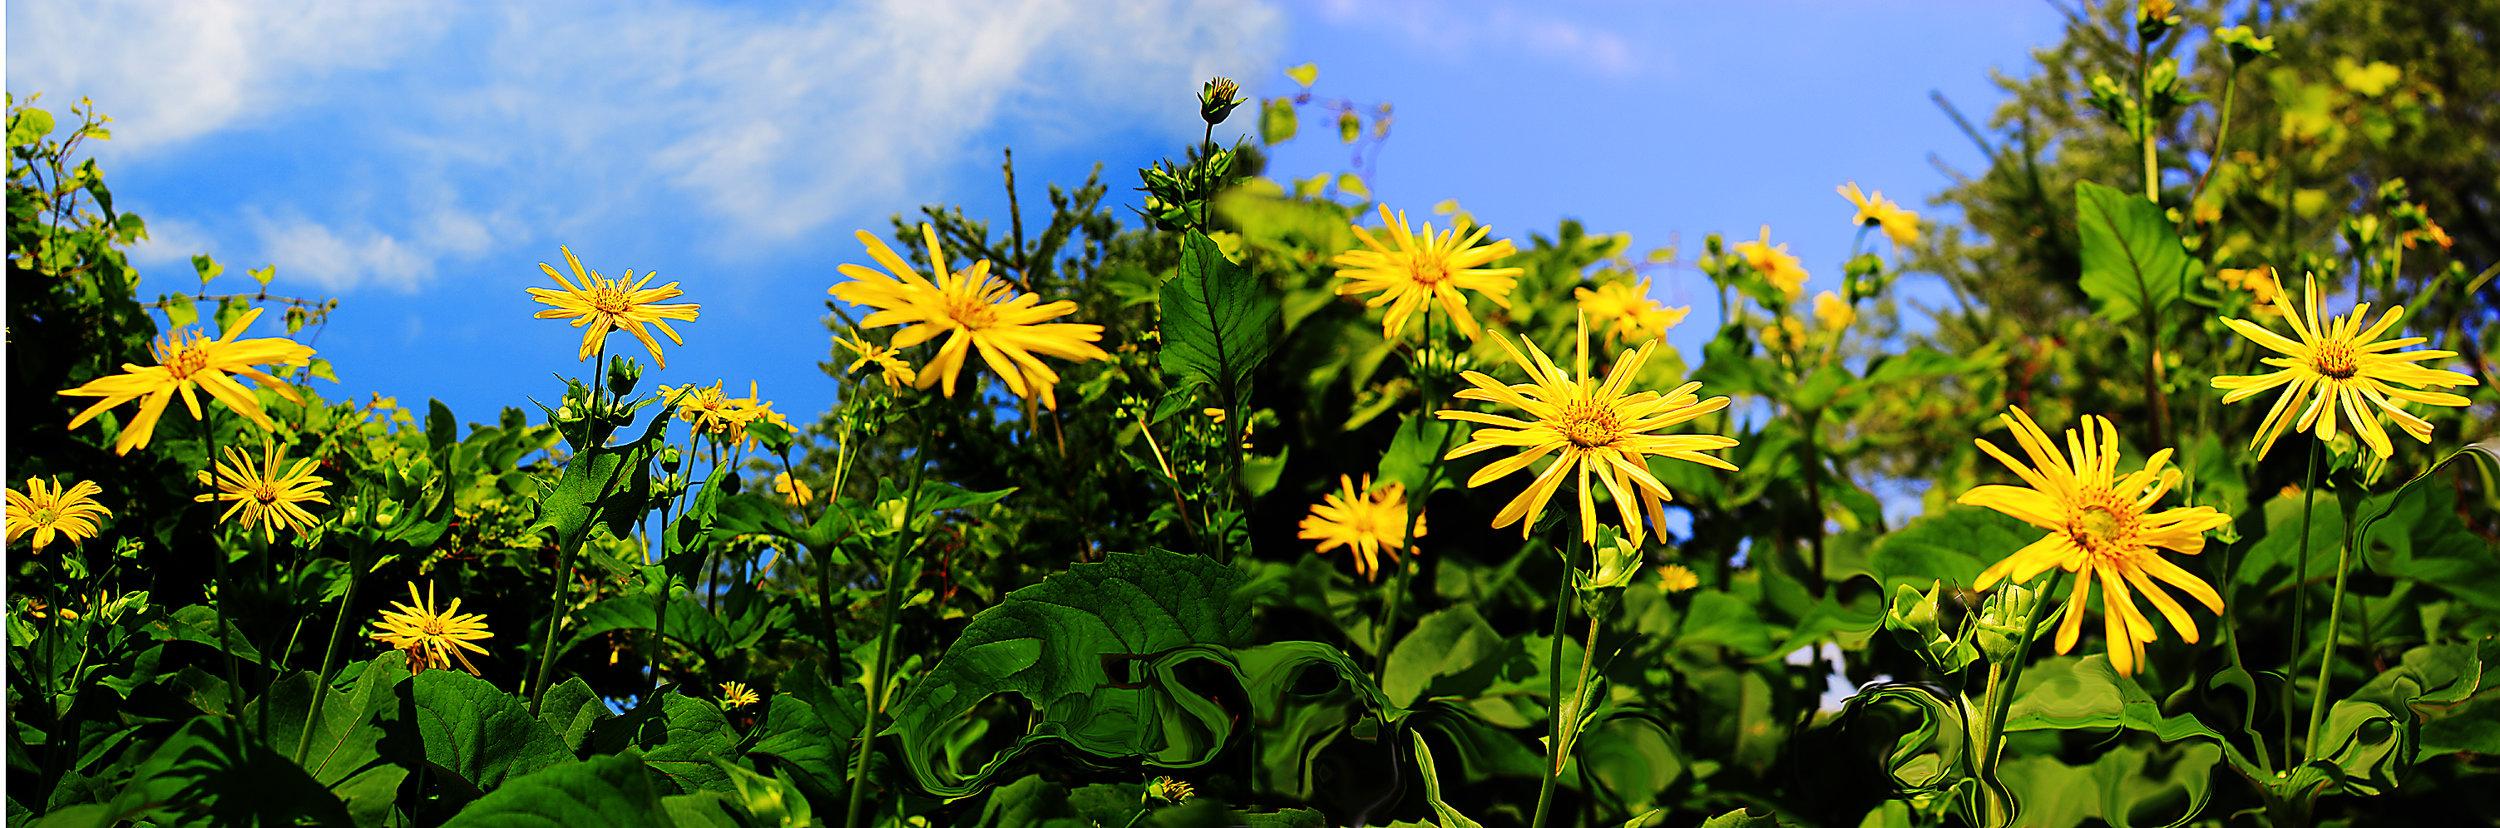 sunflower duotych.jpg